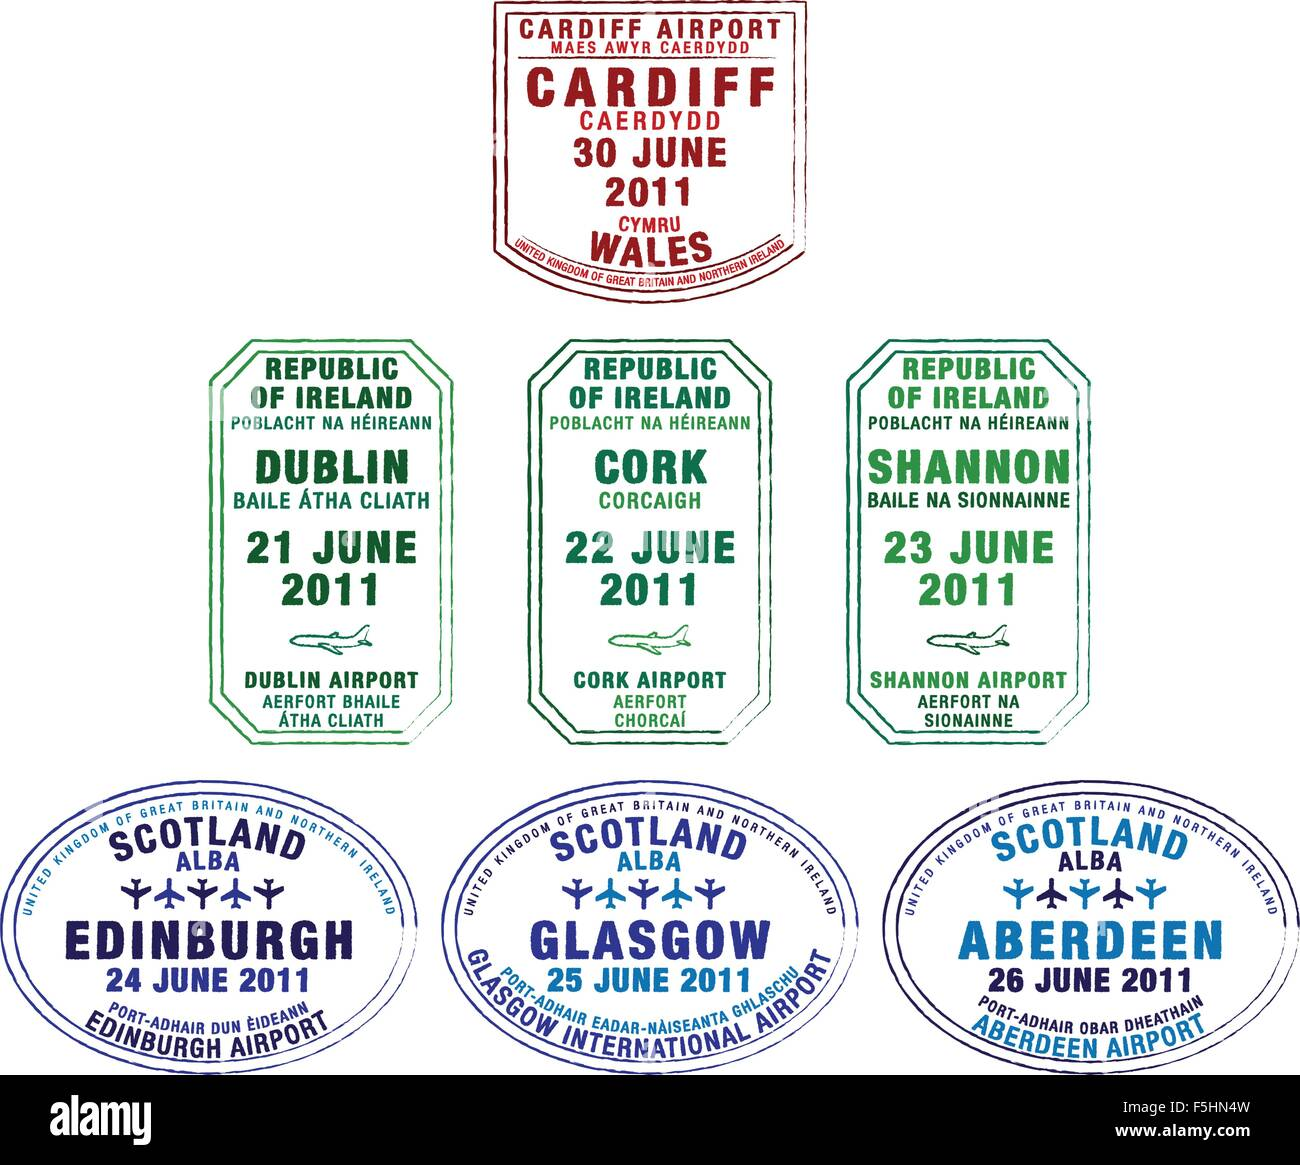 Passport stamps of Wales, Republic of Ireland and Scotland in vector format. - Stock Vector